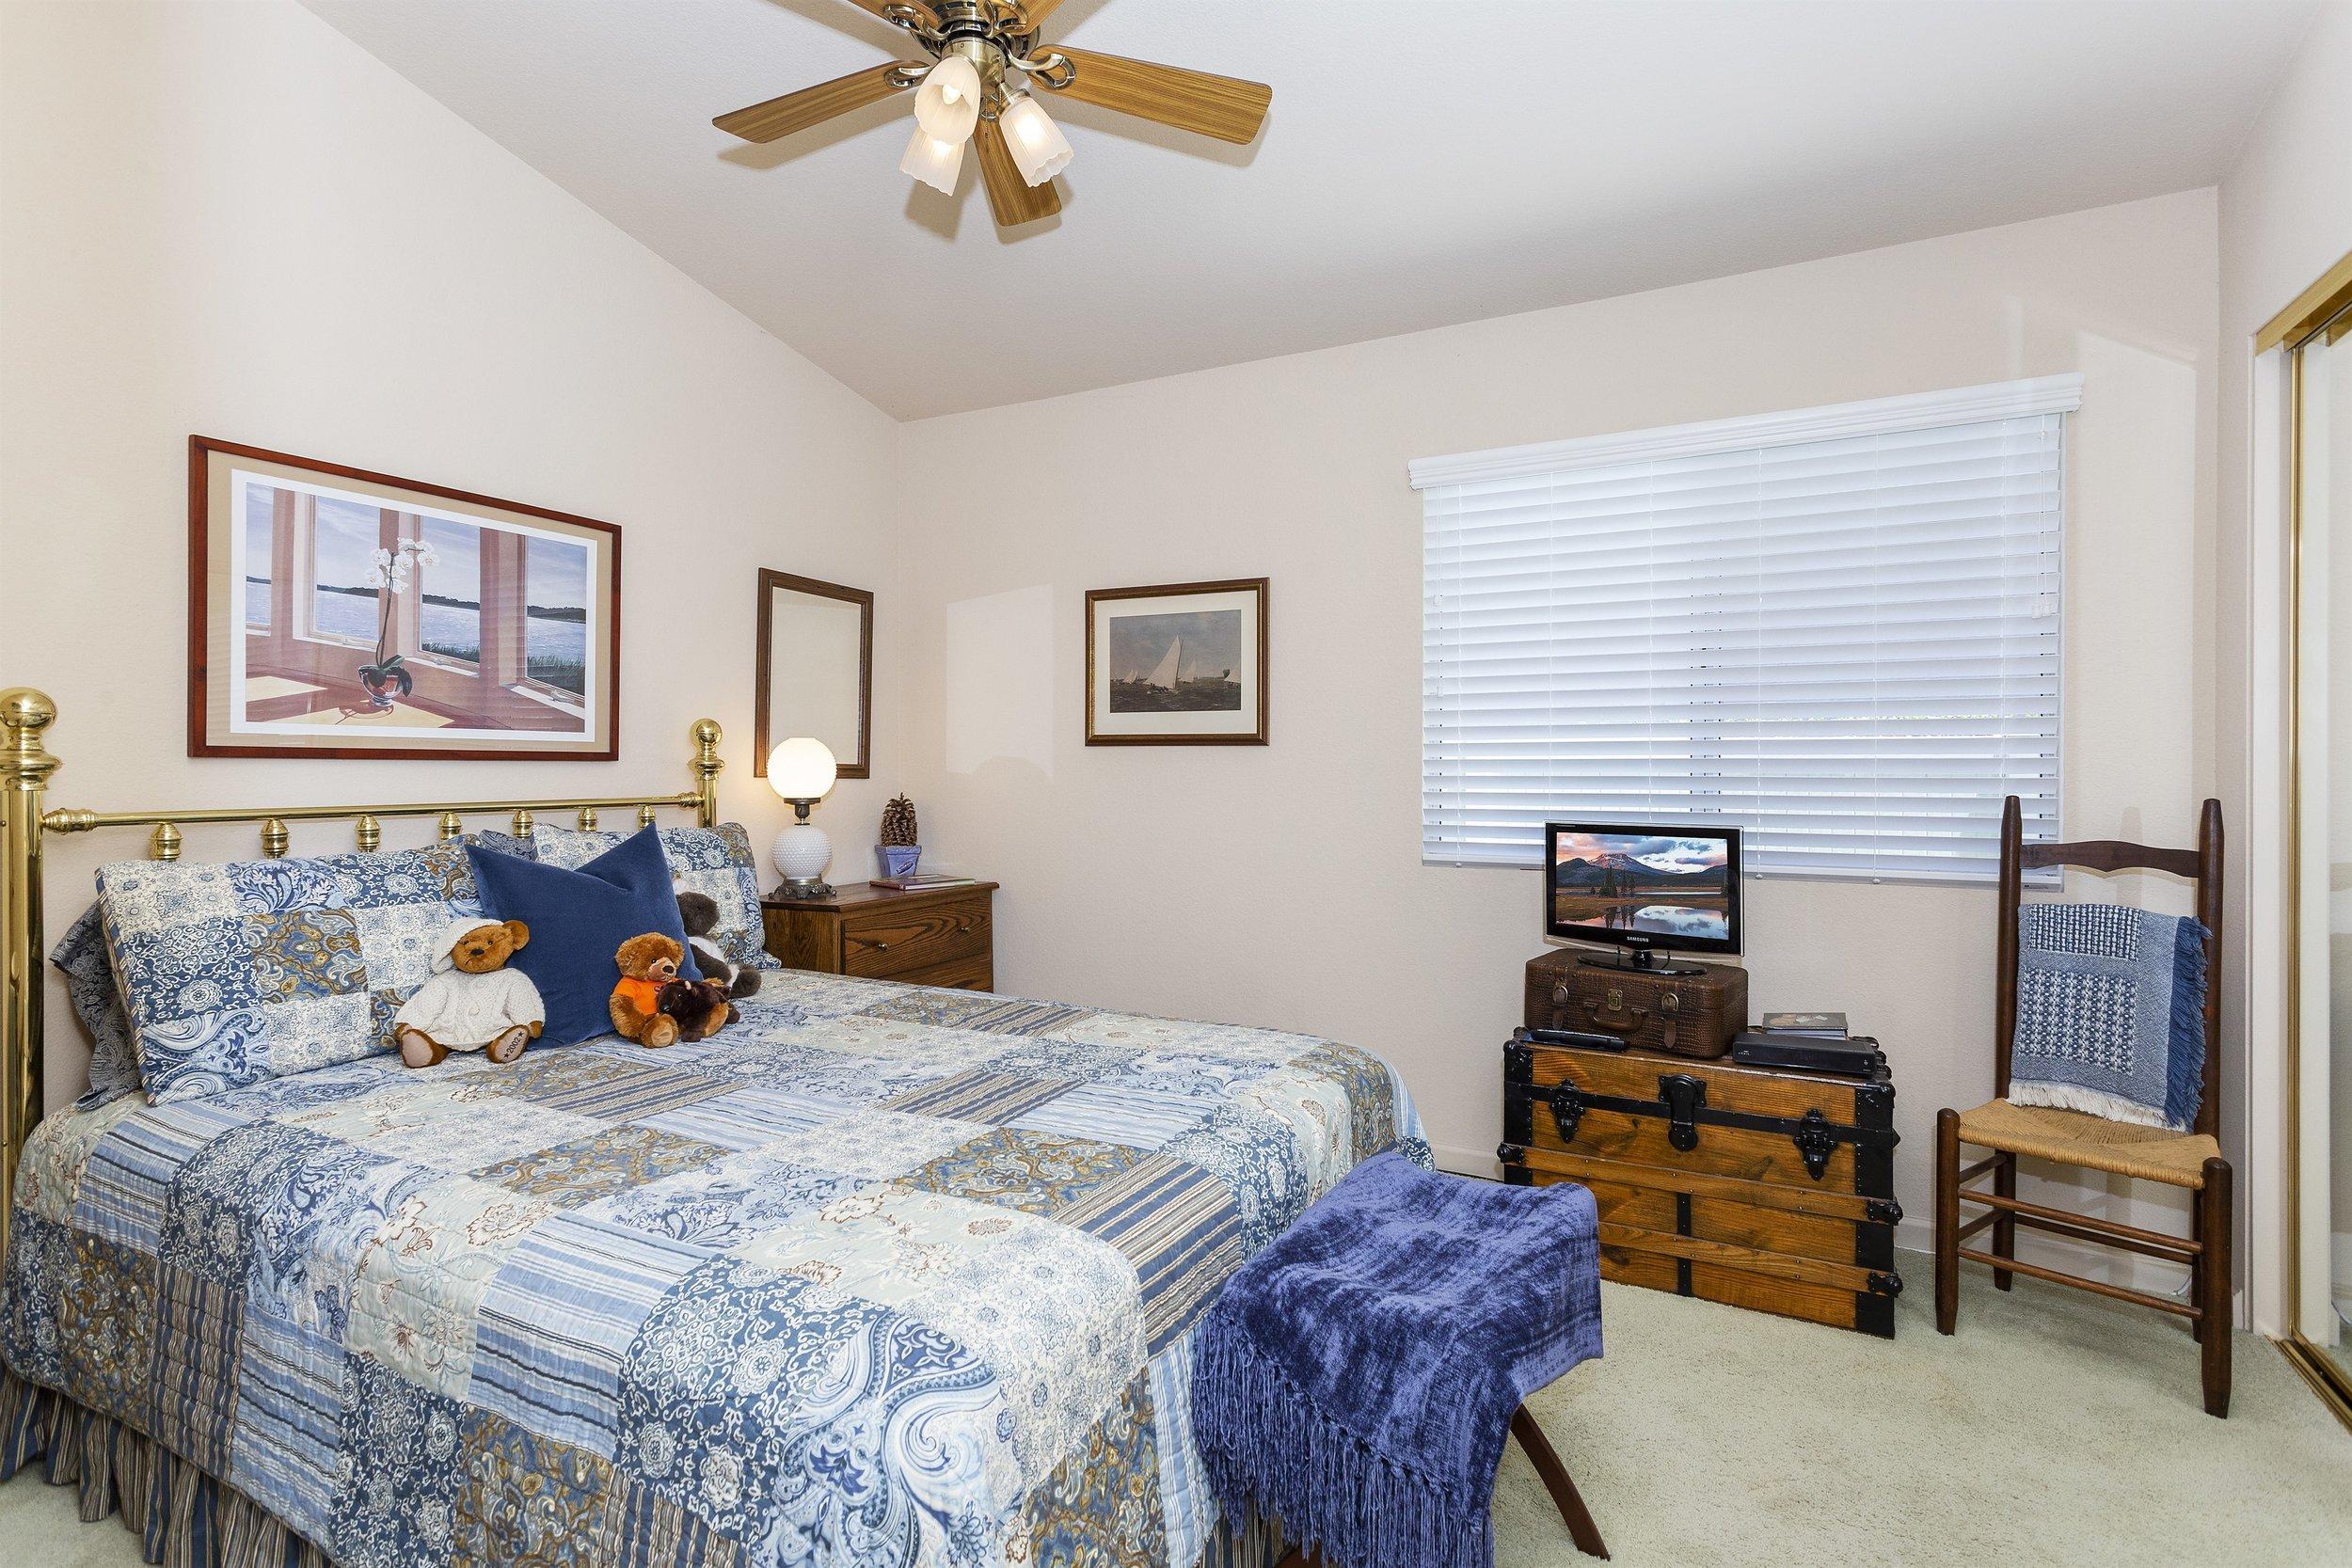 024_Bedroom.jpg